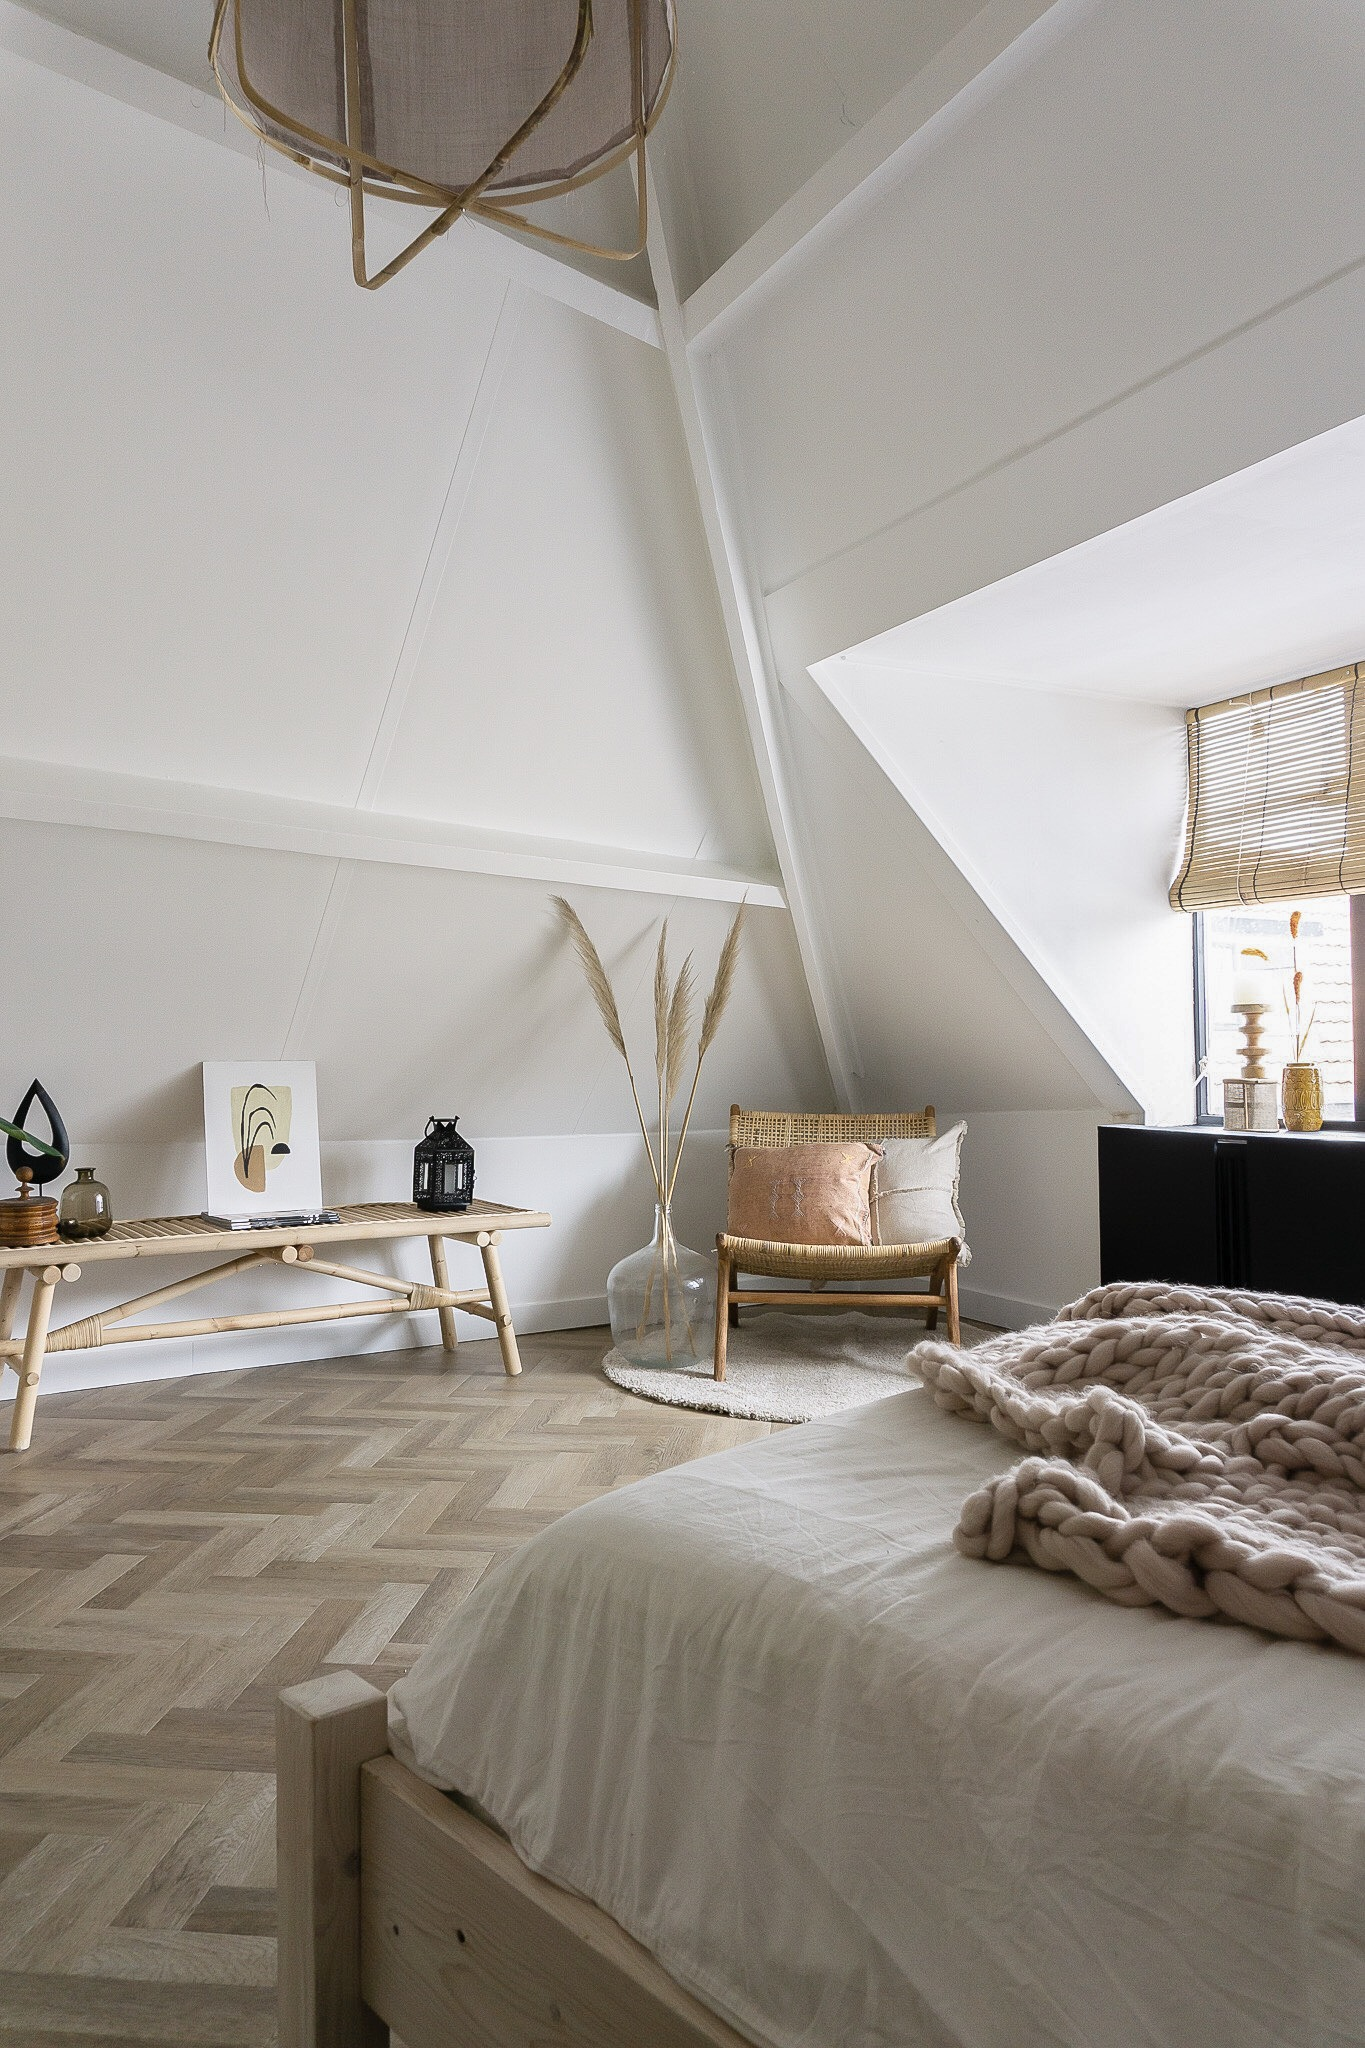 rotan stoel in lichte slaapkamer